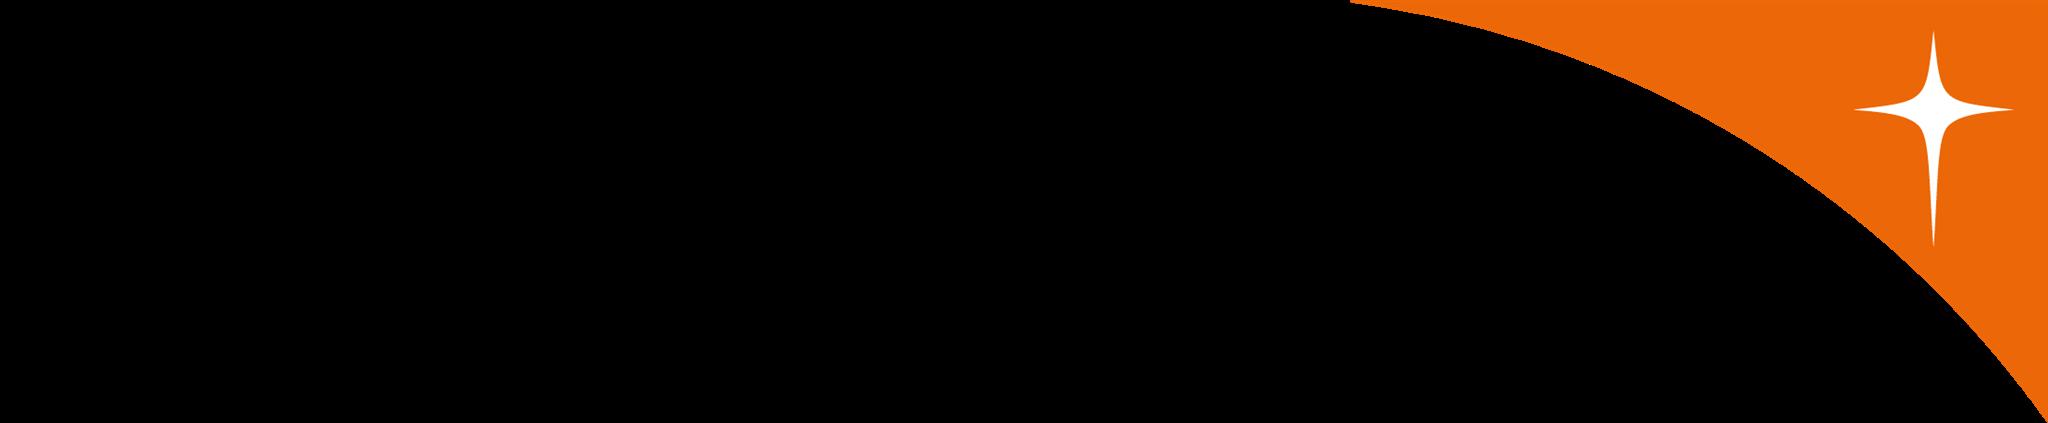 WVI logo.png